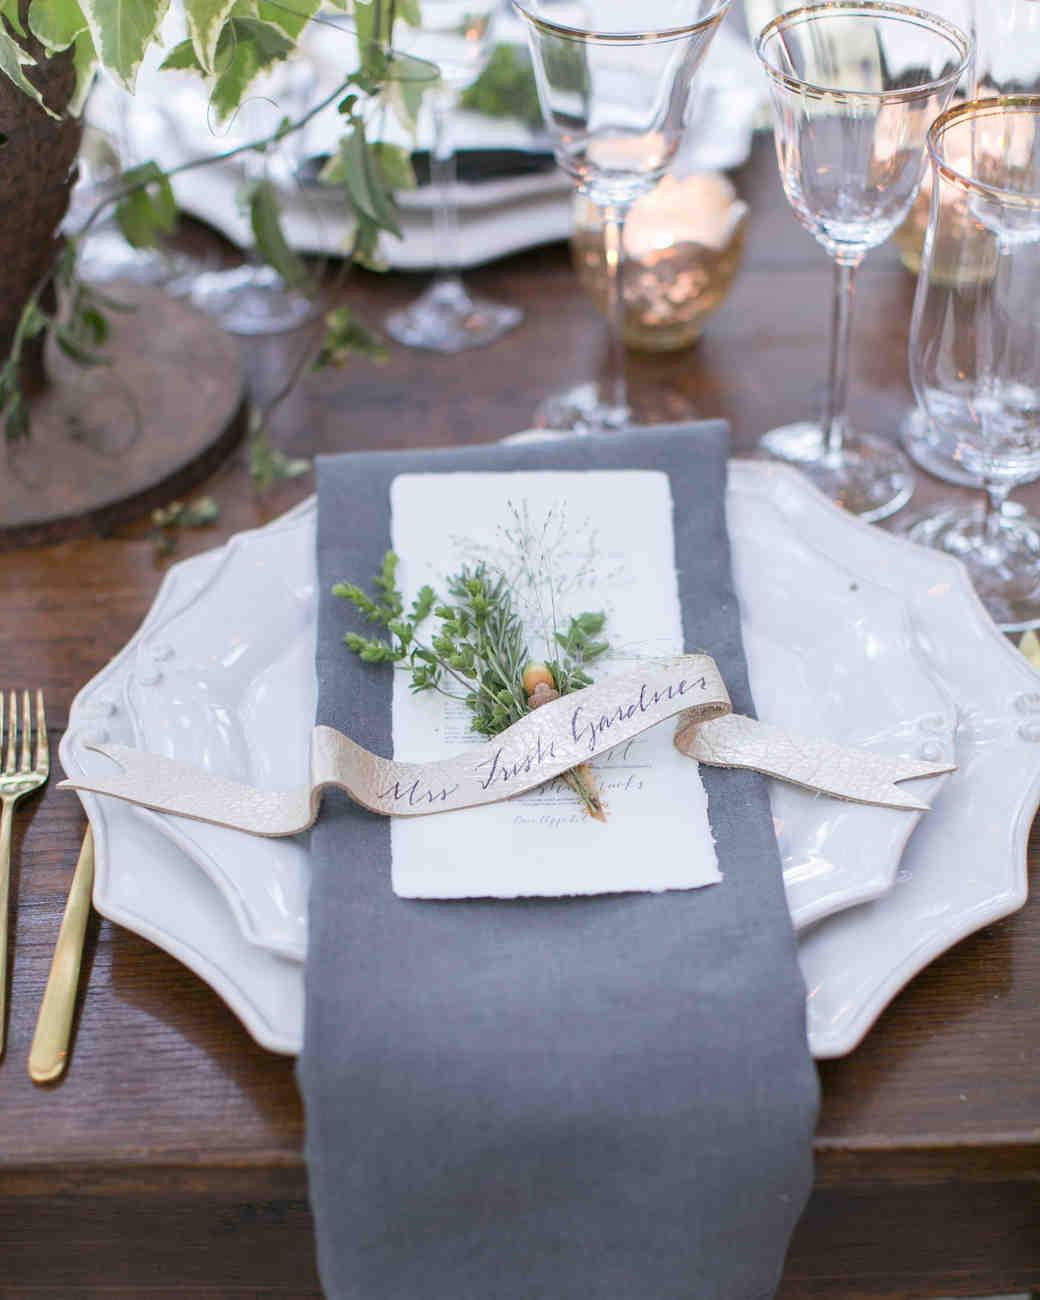 briana-adam-wedding-placesetting-0966-s112471-1215.jpg